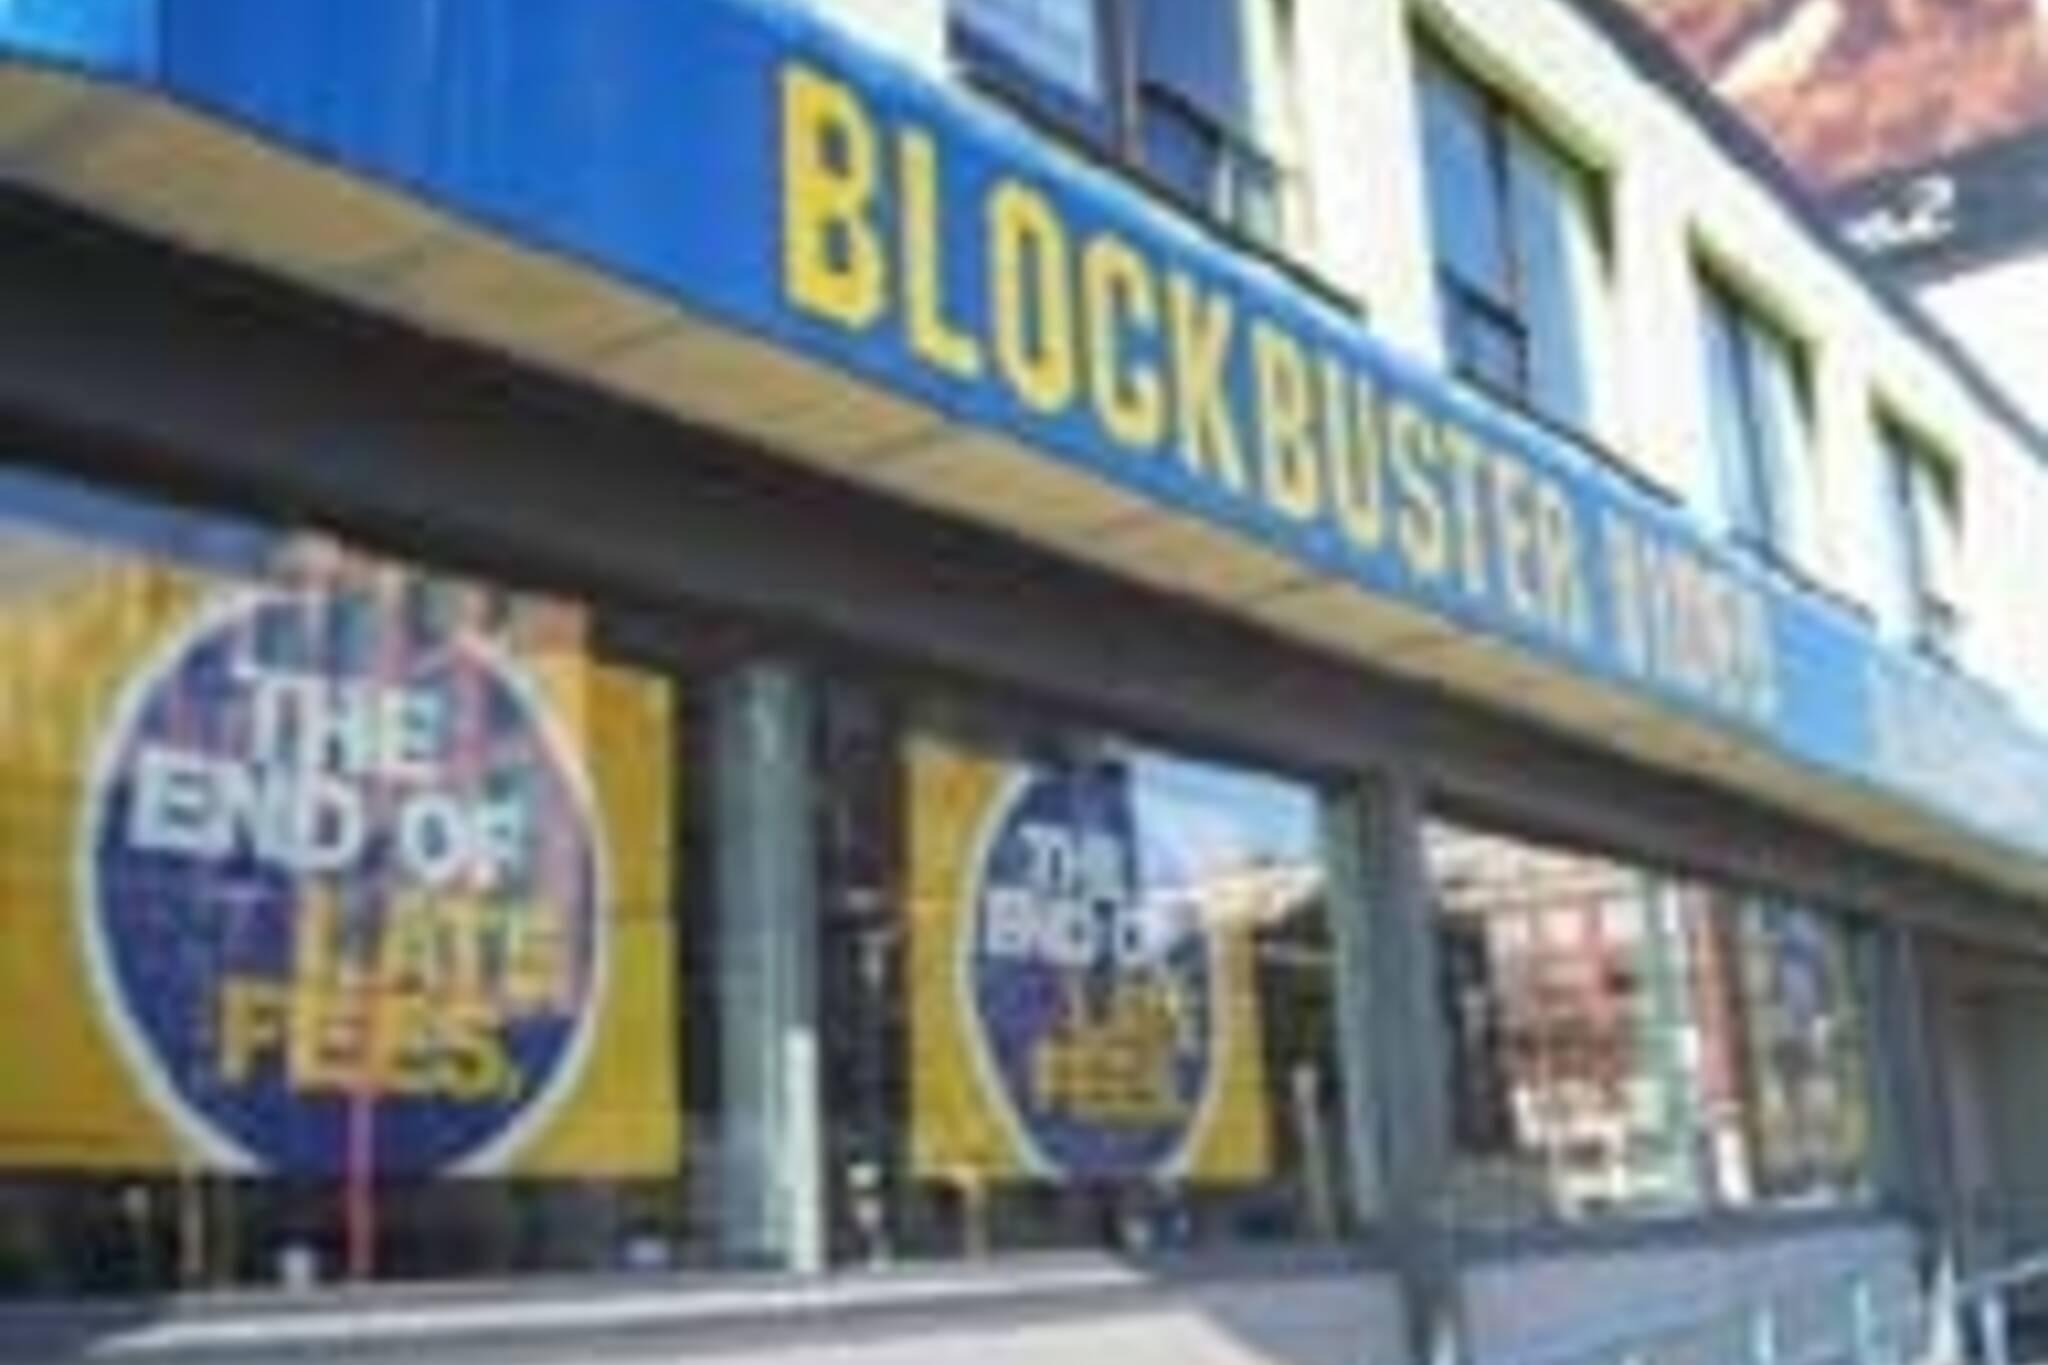 feb1905_blockbuster.JPG